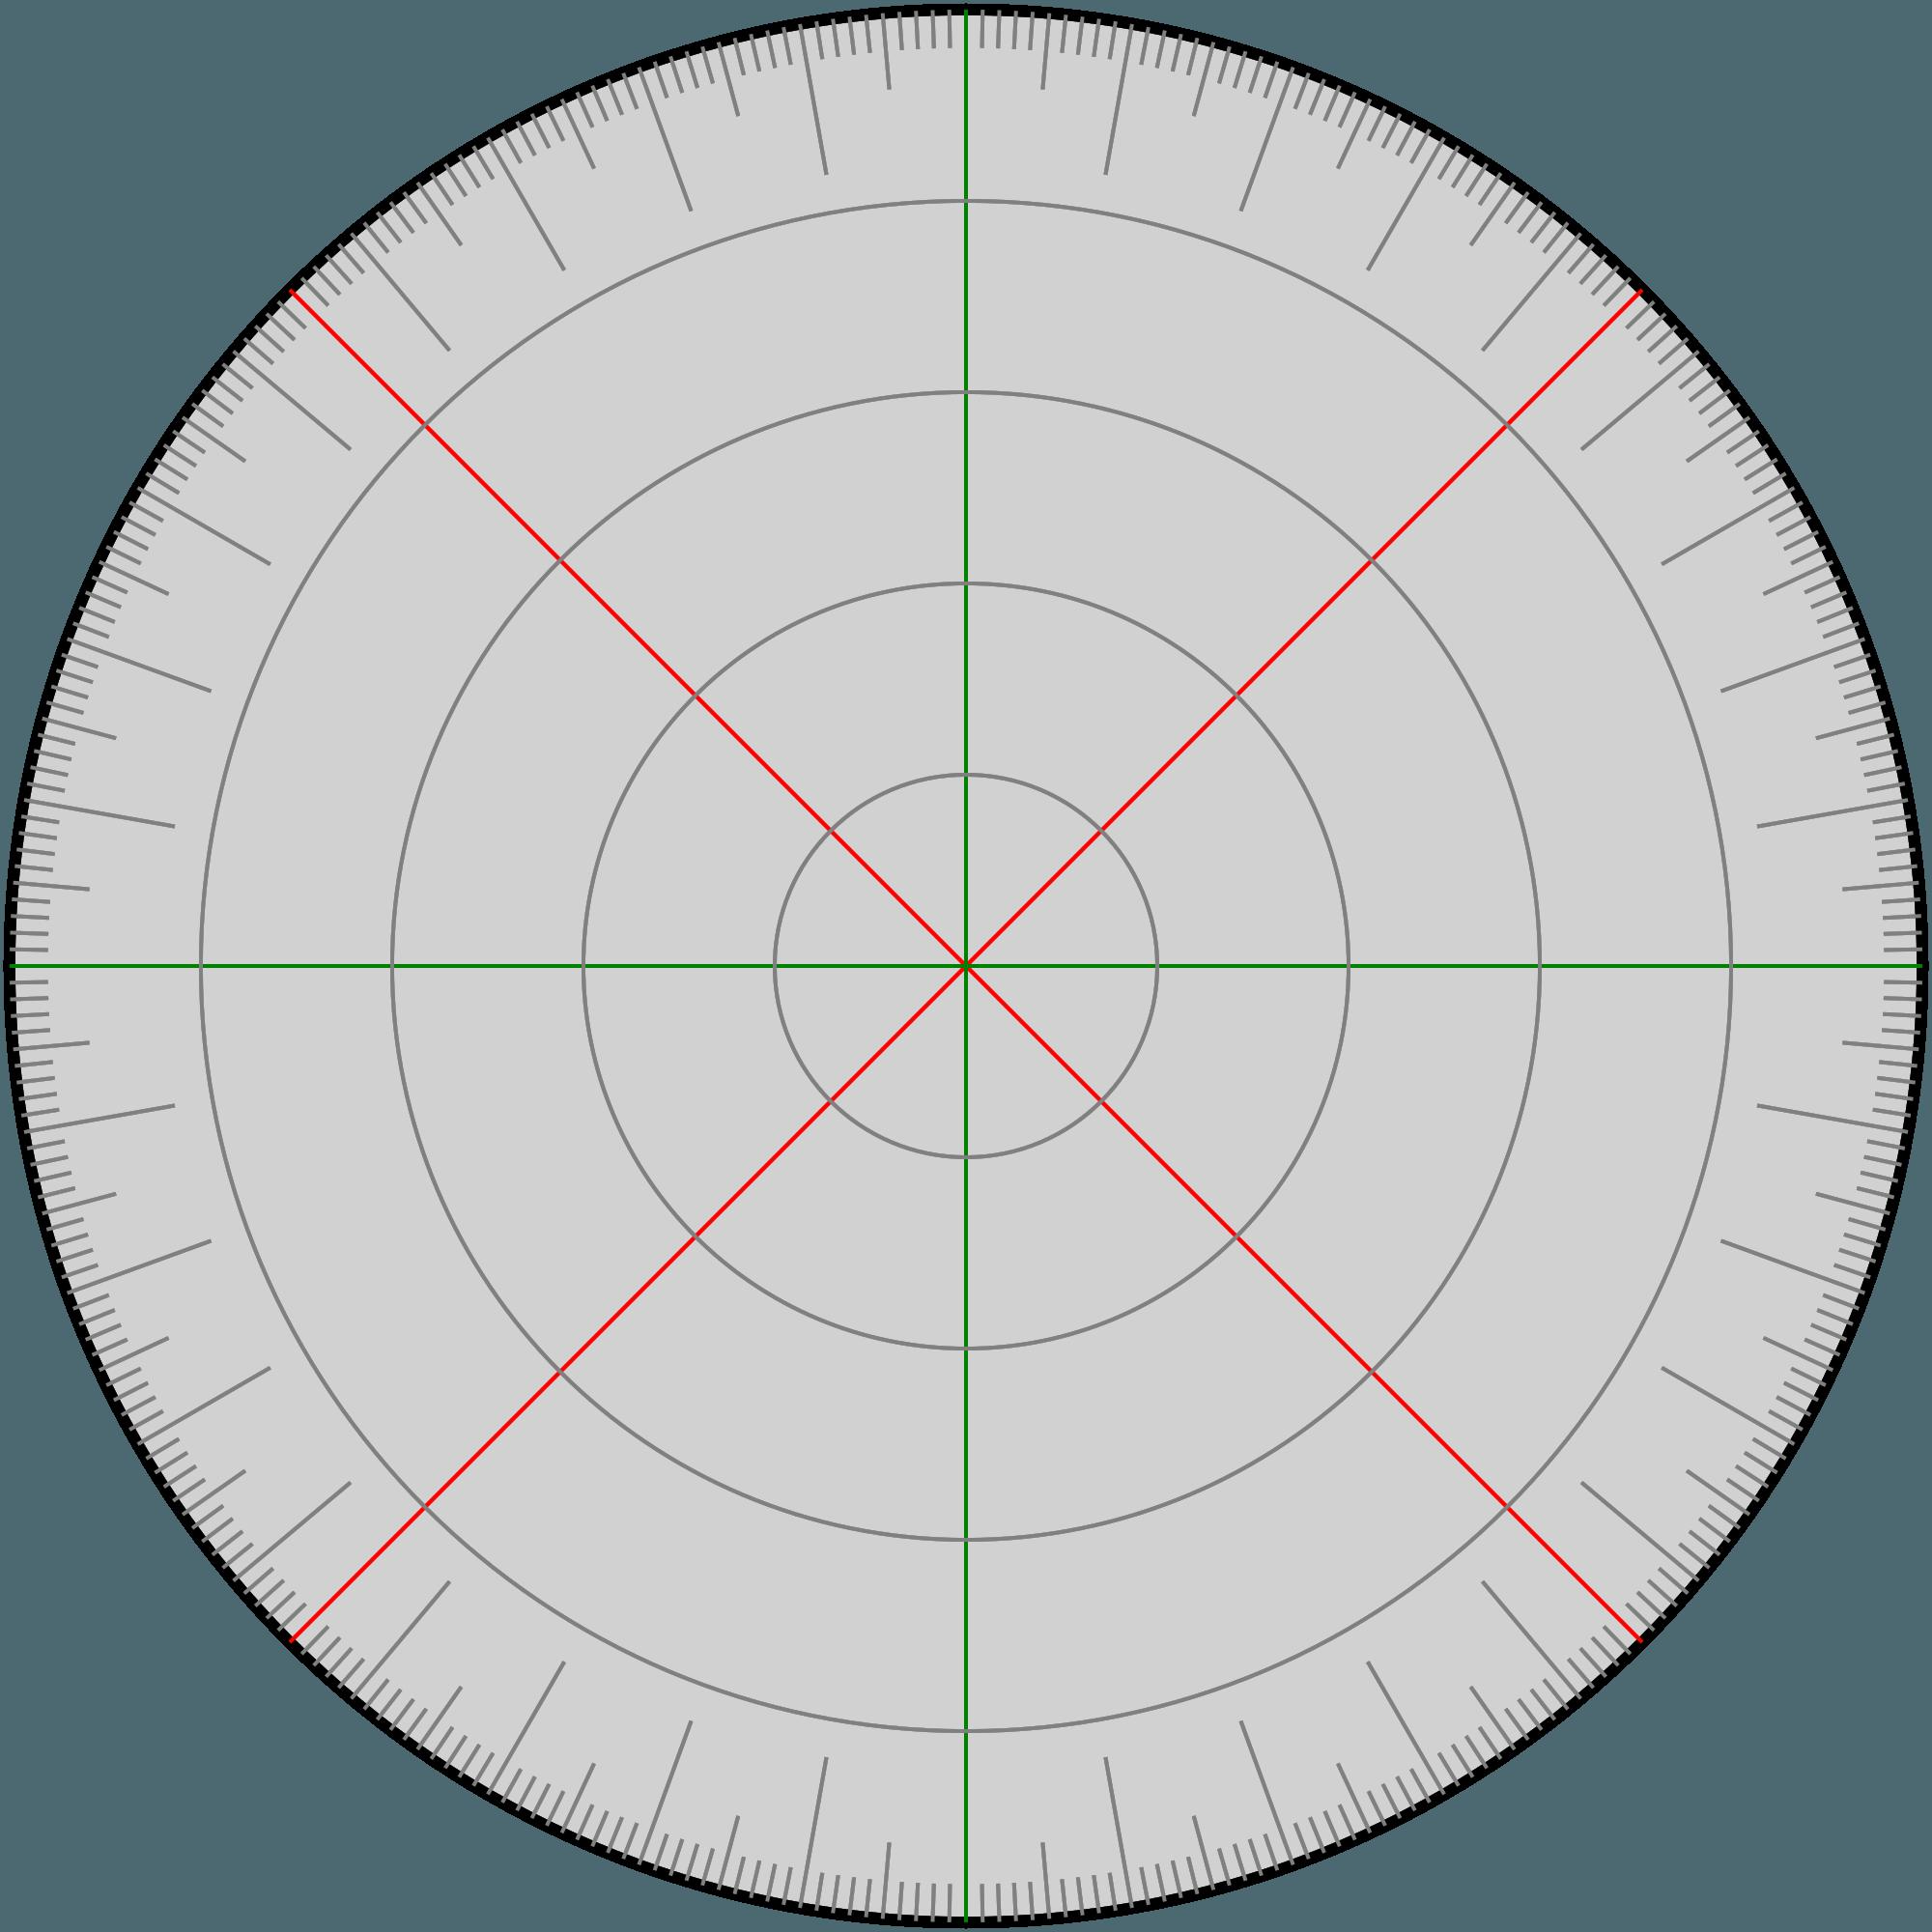 360 Degree Protractor Template